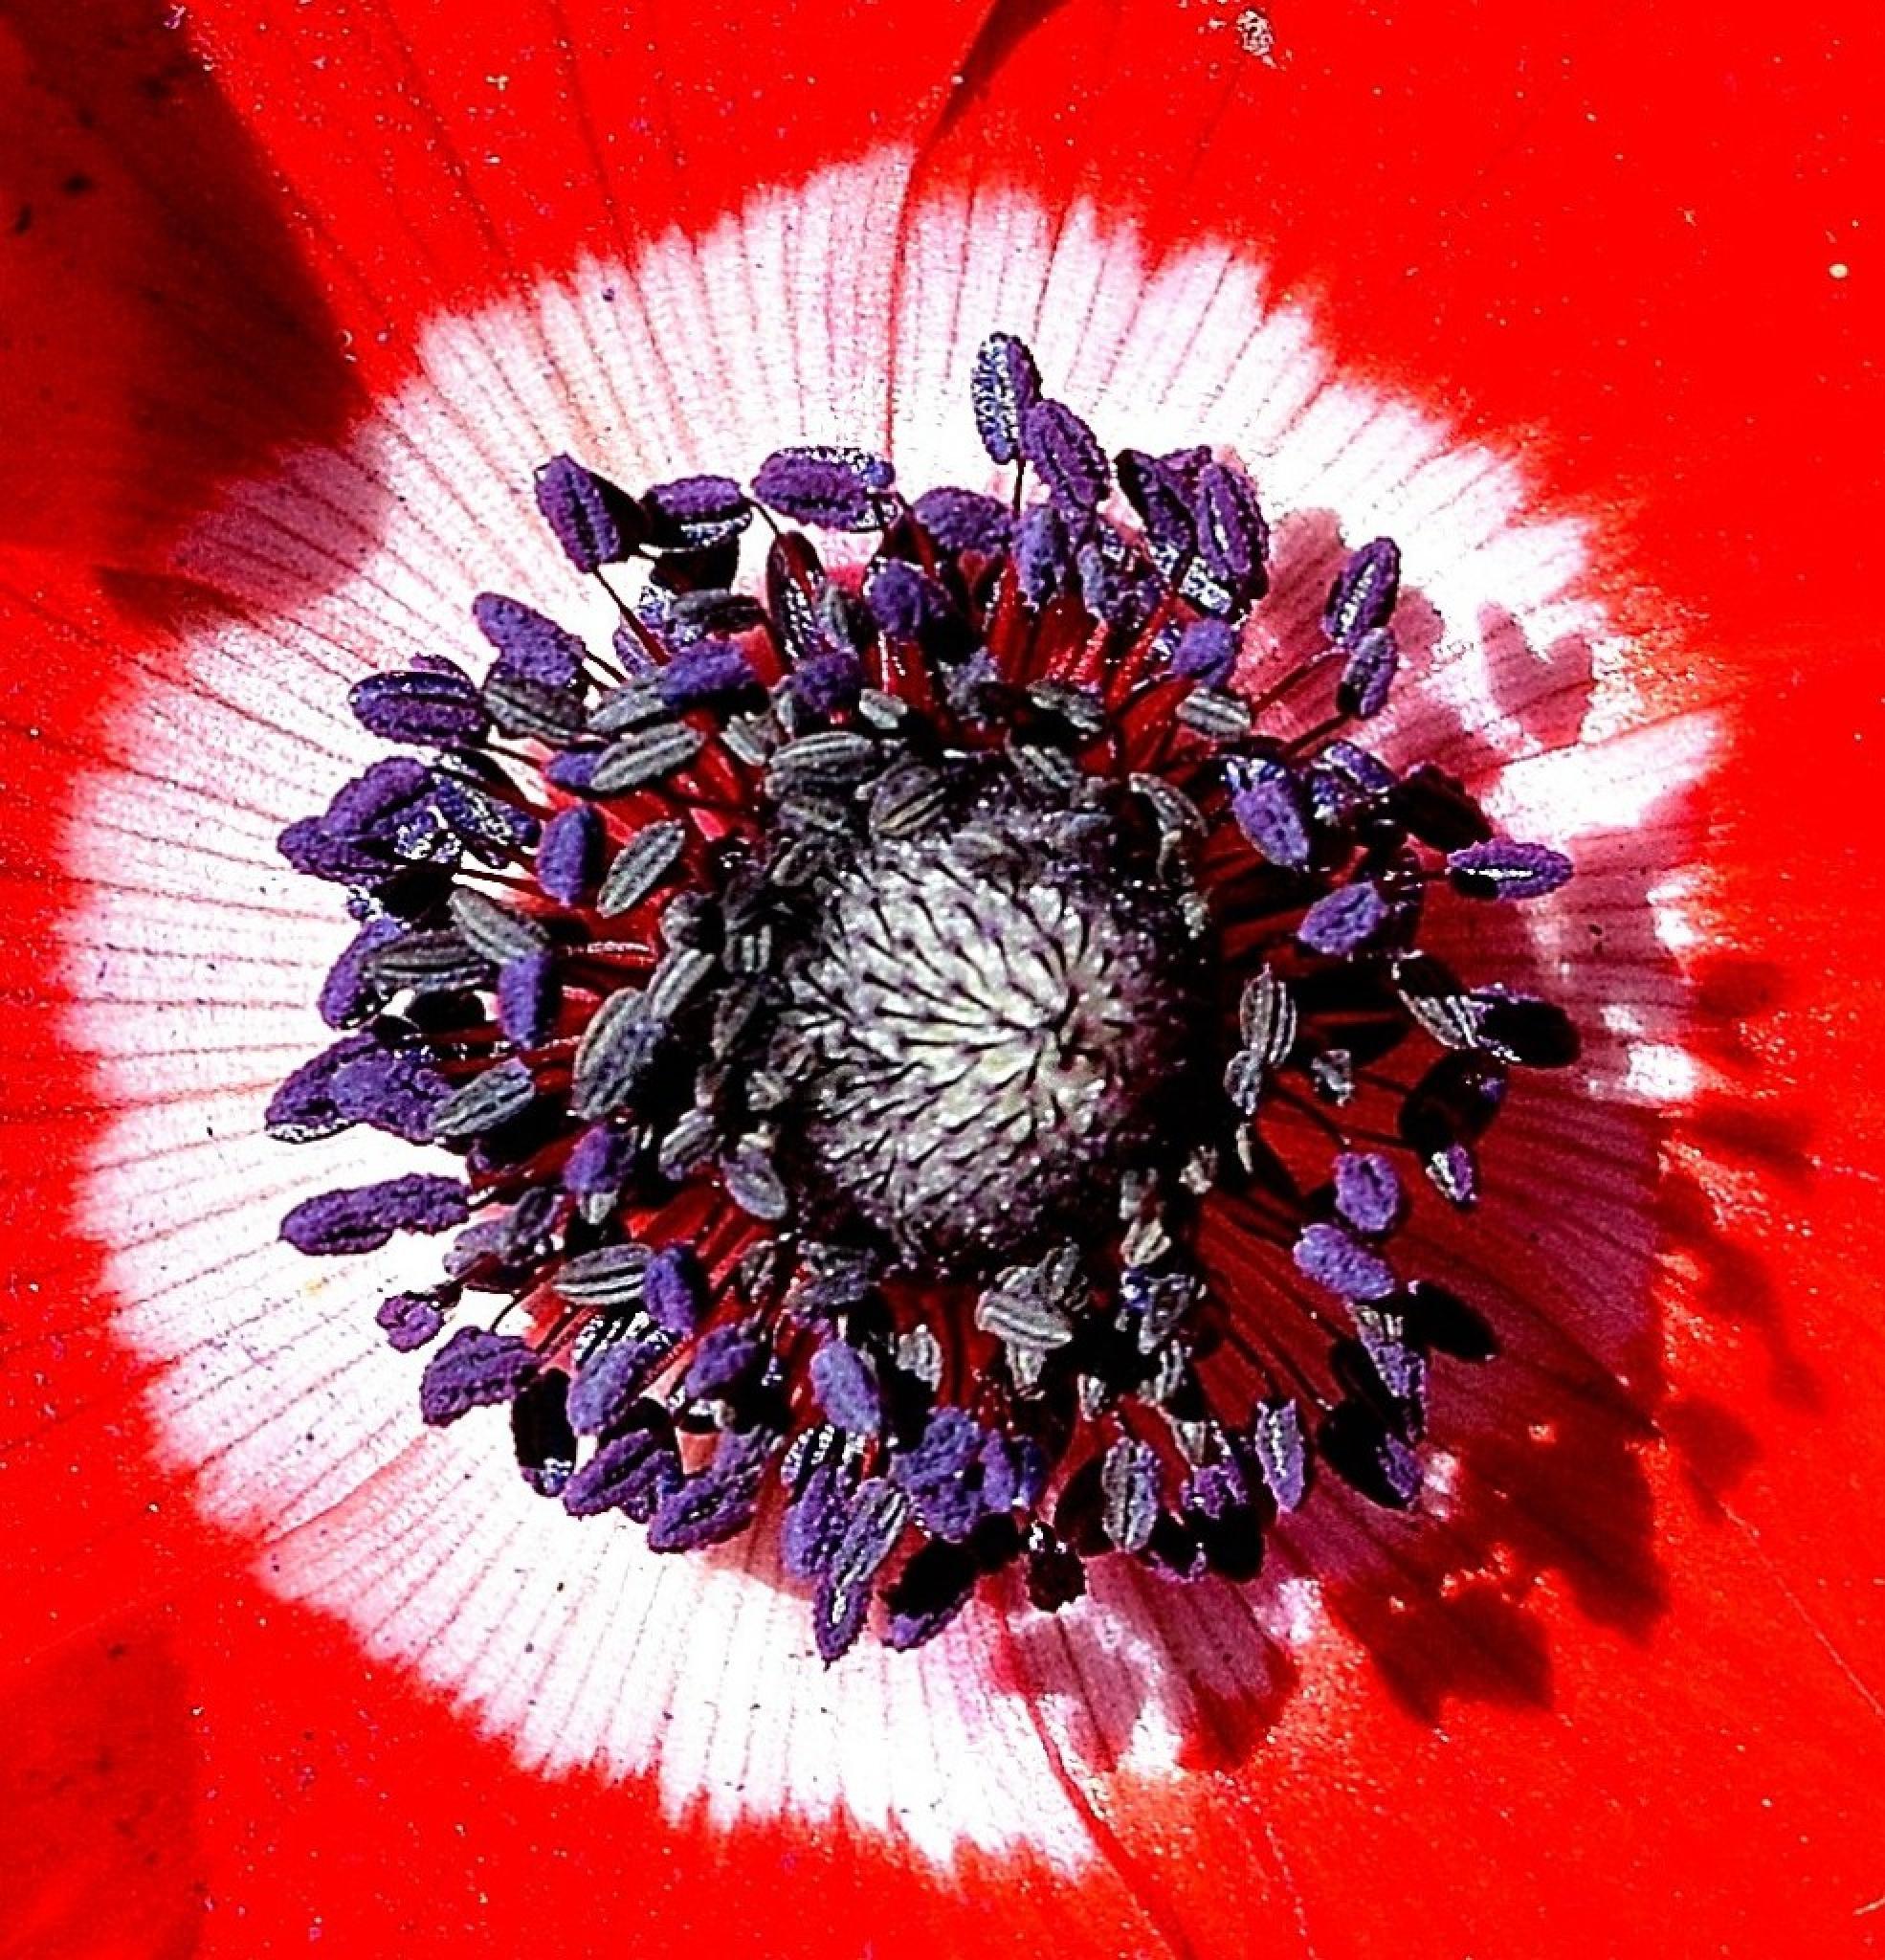 Anemone by אשר שמולביץ